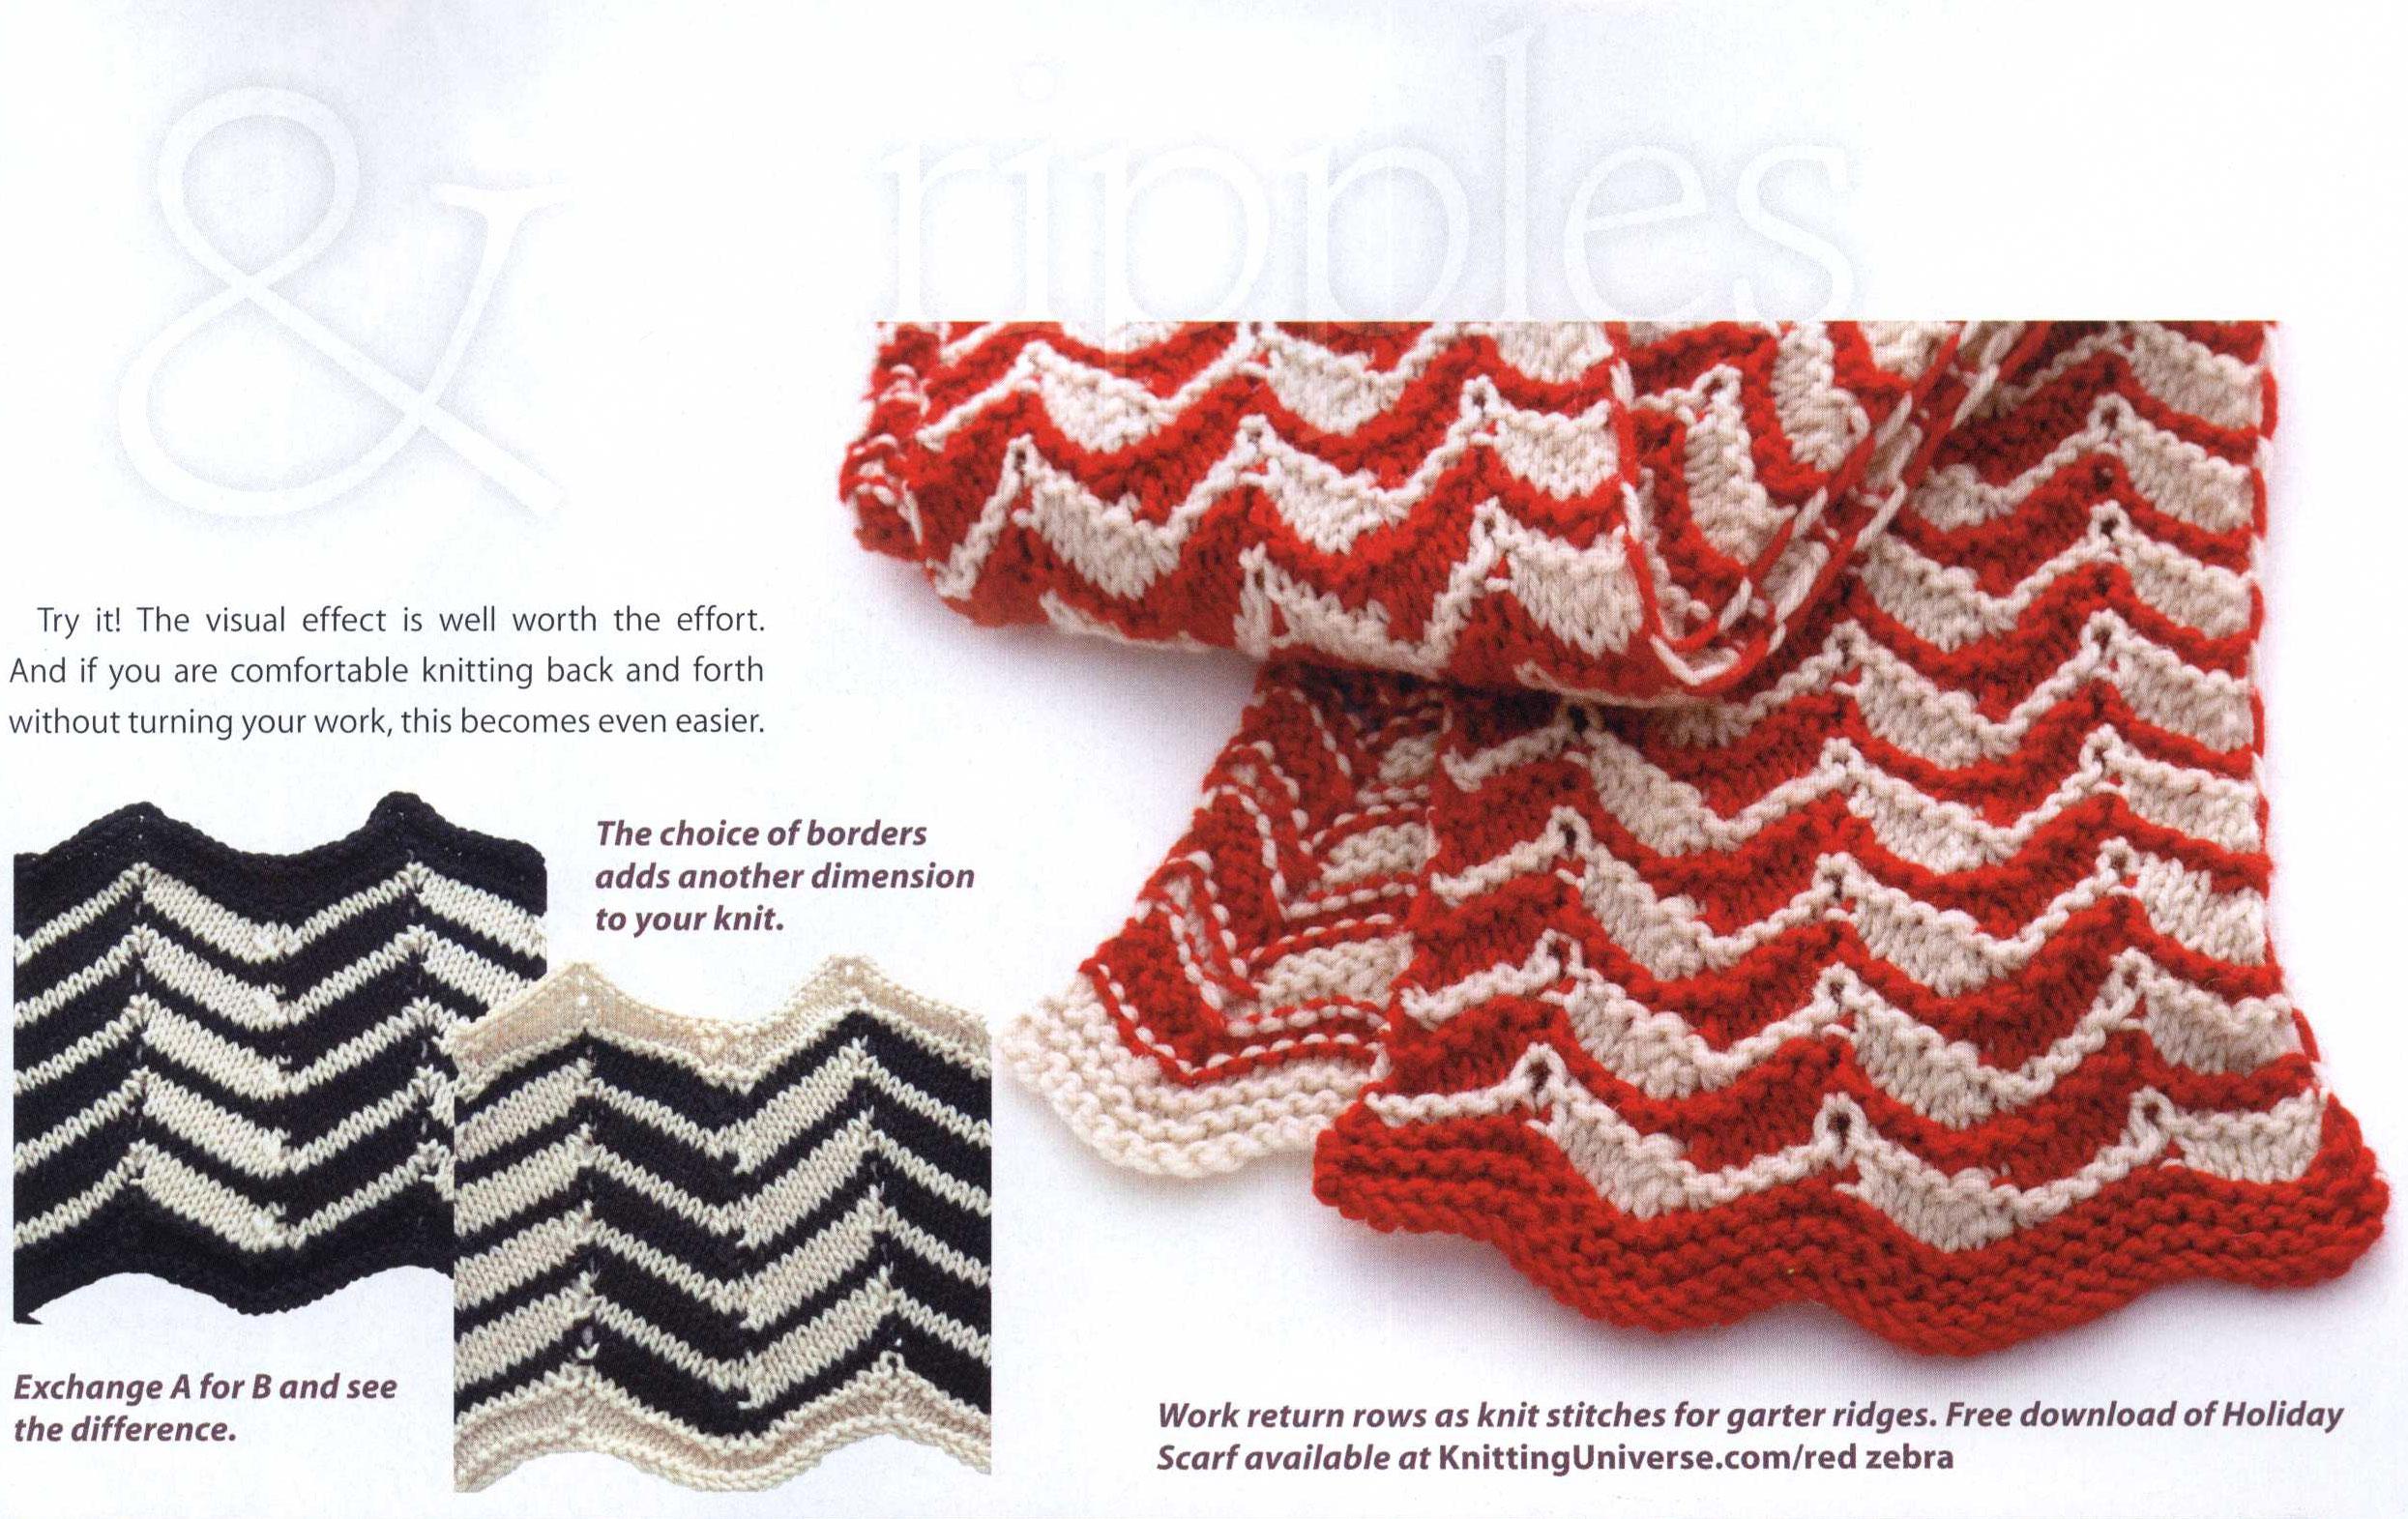 Short Rows And Ripples Three Tops Knitting Patterns Knitting Free